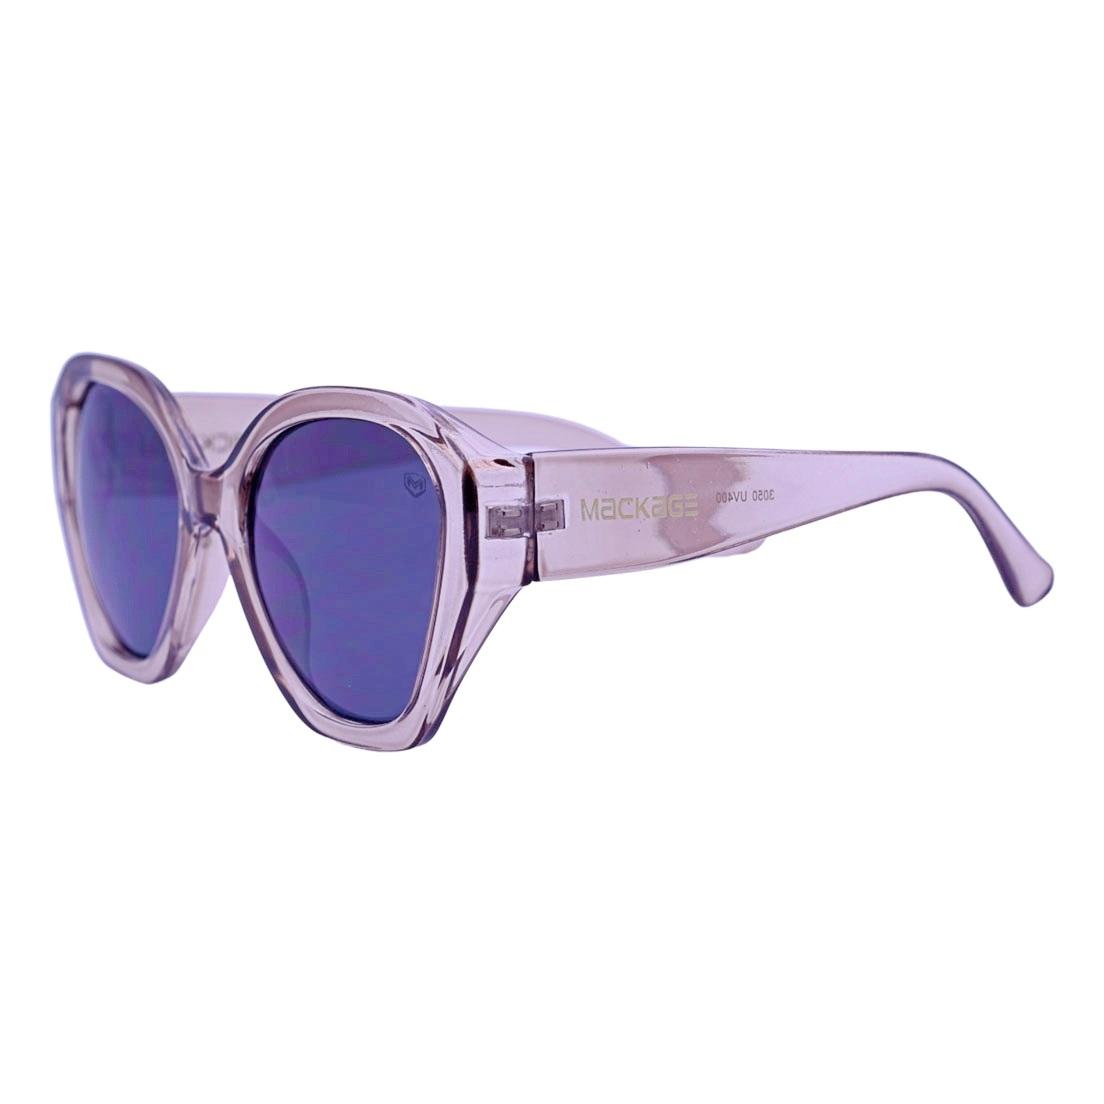 Óculos De Sol Mackage Feminino Acetato Oversize - Marrom Cristal